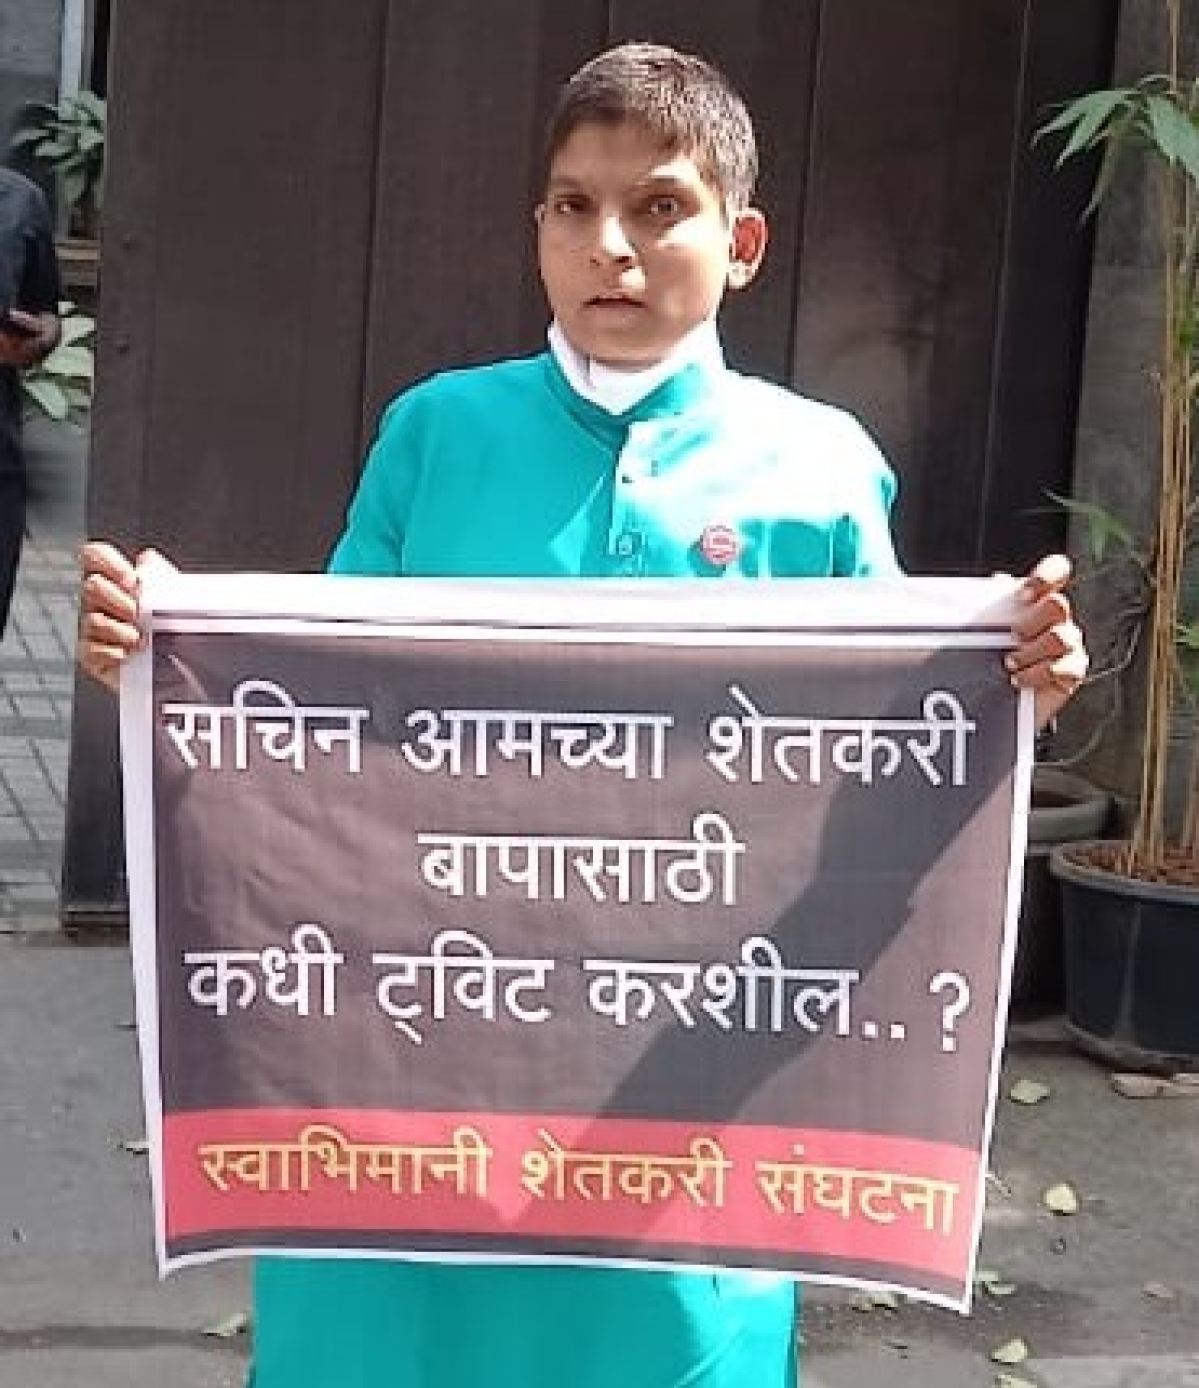 Swabhimani Shetkari Saghtana worker Ranjeet Bagal protest outside Sachin Tendulkar's house in Bandra.